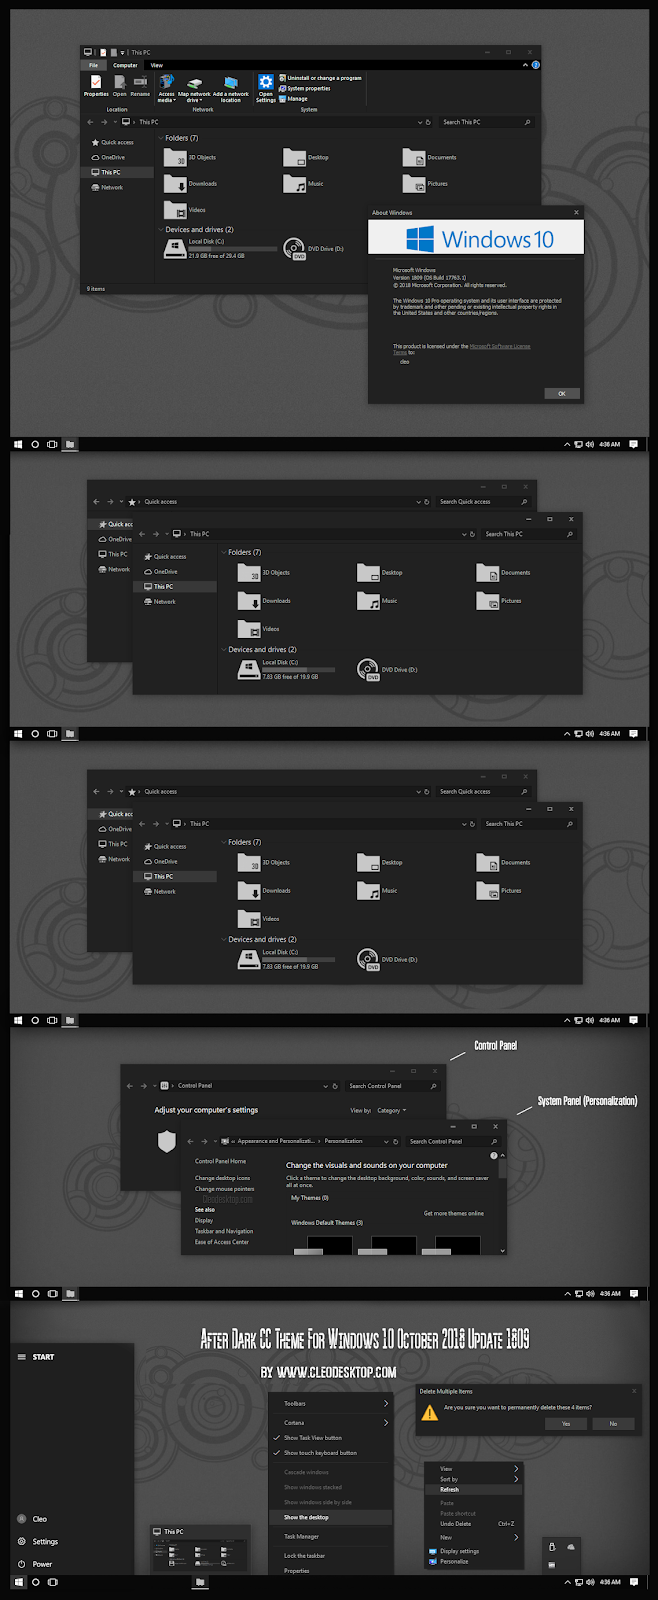 Windows10 Themes I Cleodesktop: After Dark CC Theme For Windows 10